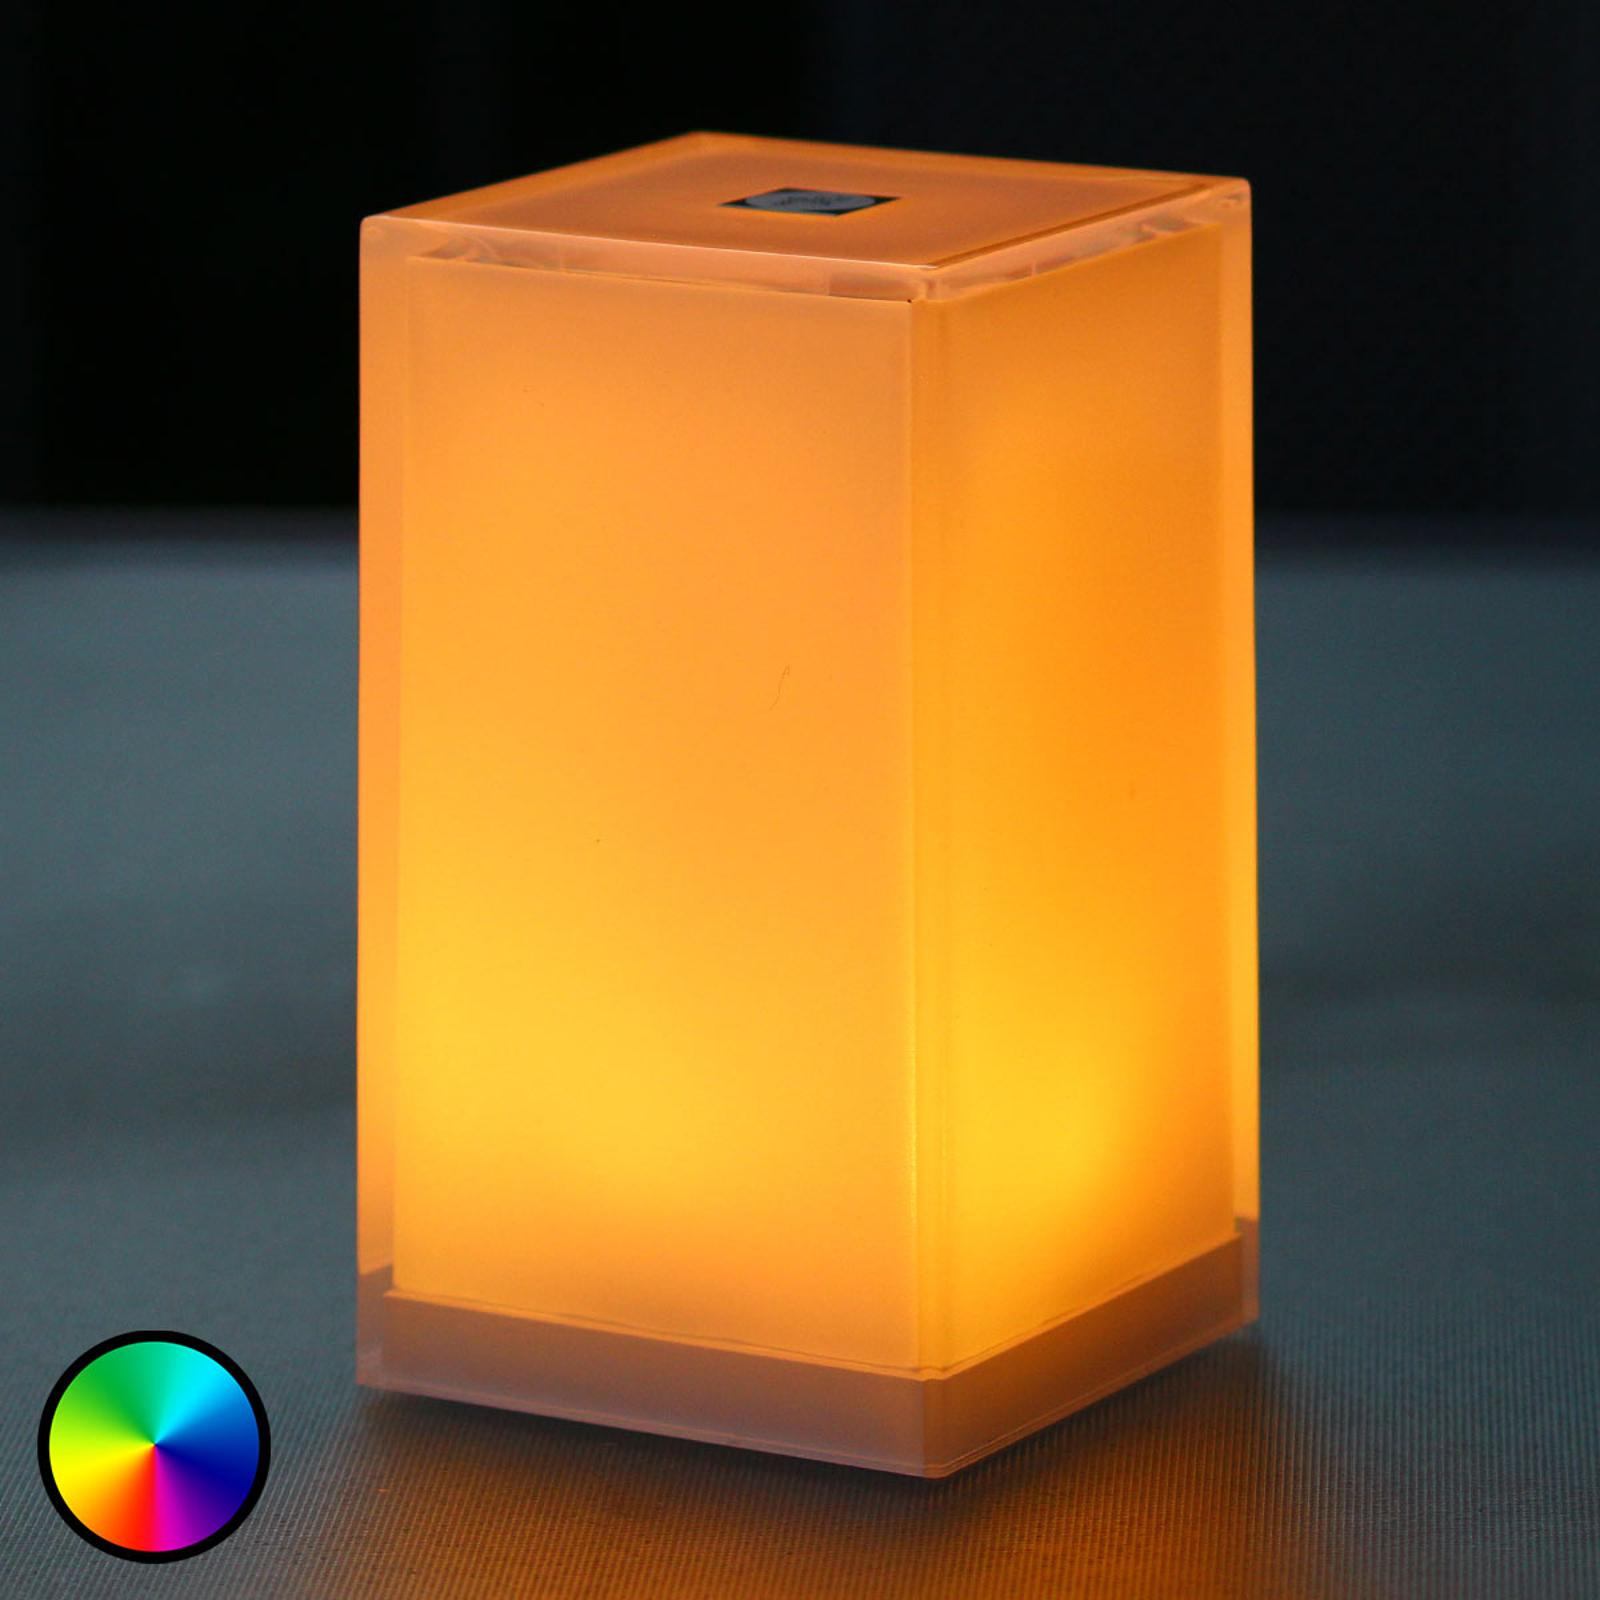 Bærbar bordlampe Cub, app kontrollerbar, RGBW